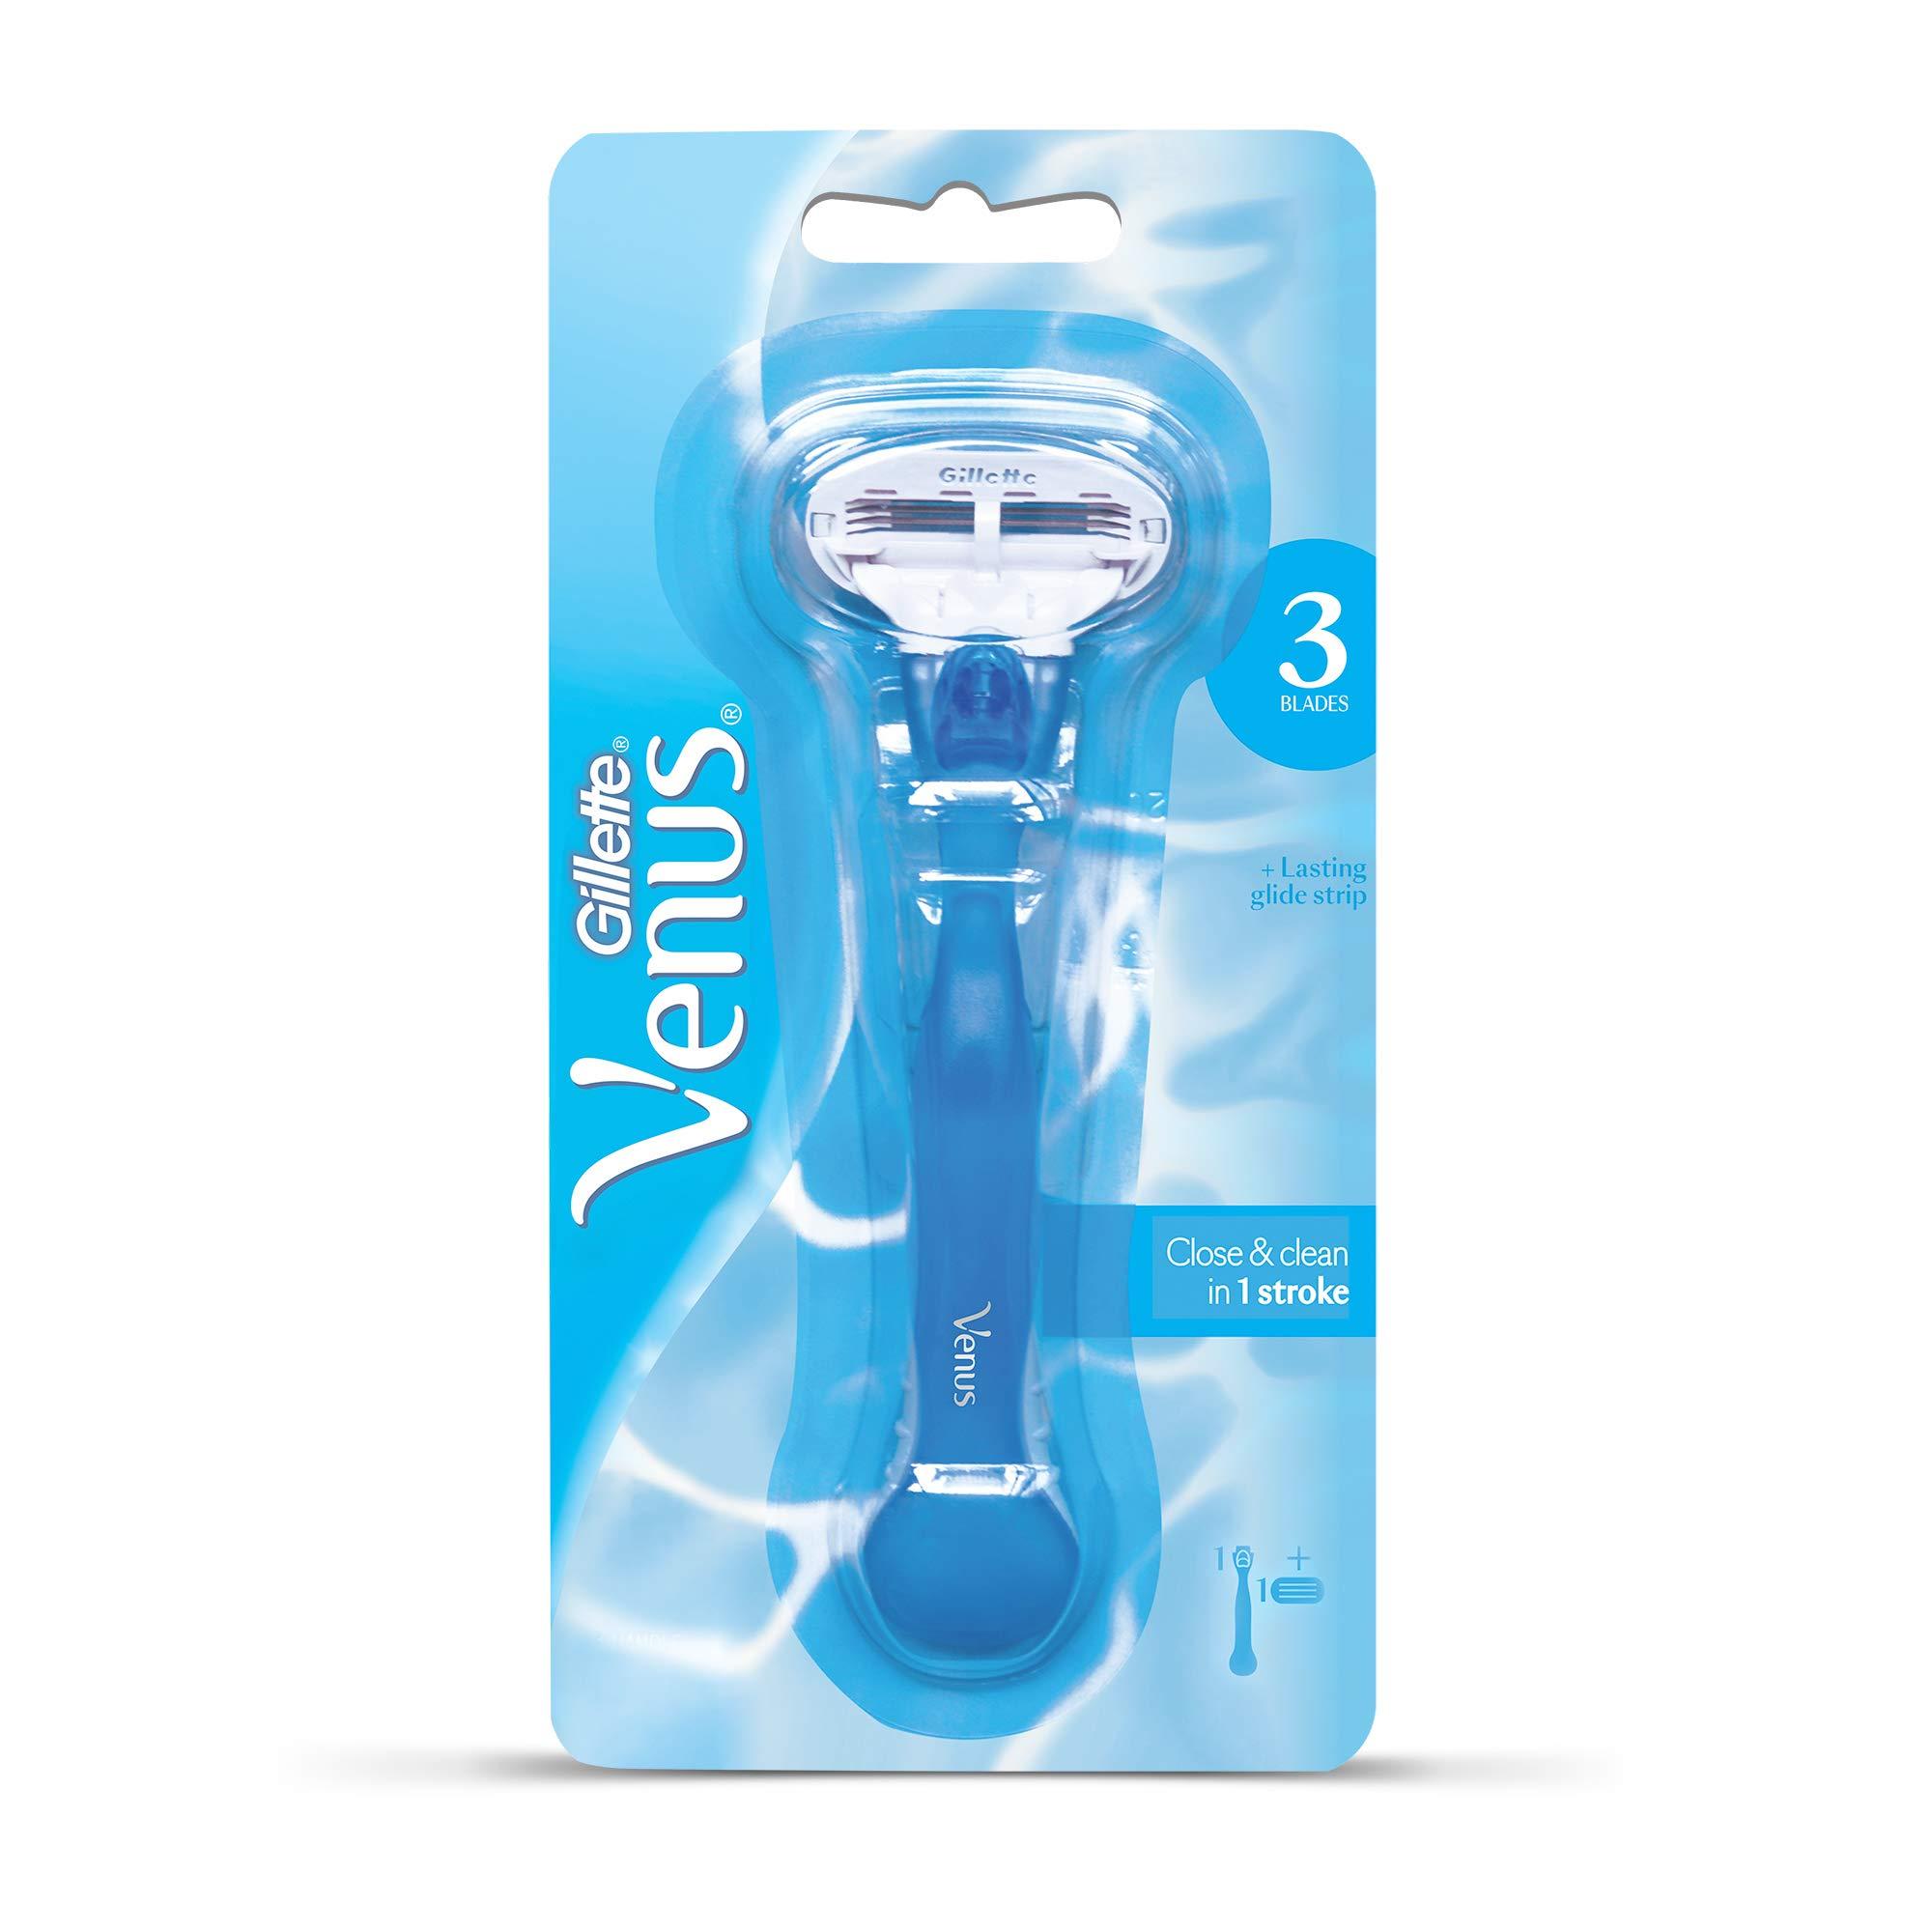 Gillette Venus Hair Removal Razor for Women product image